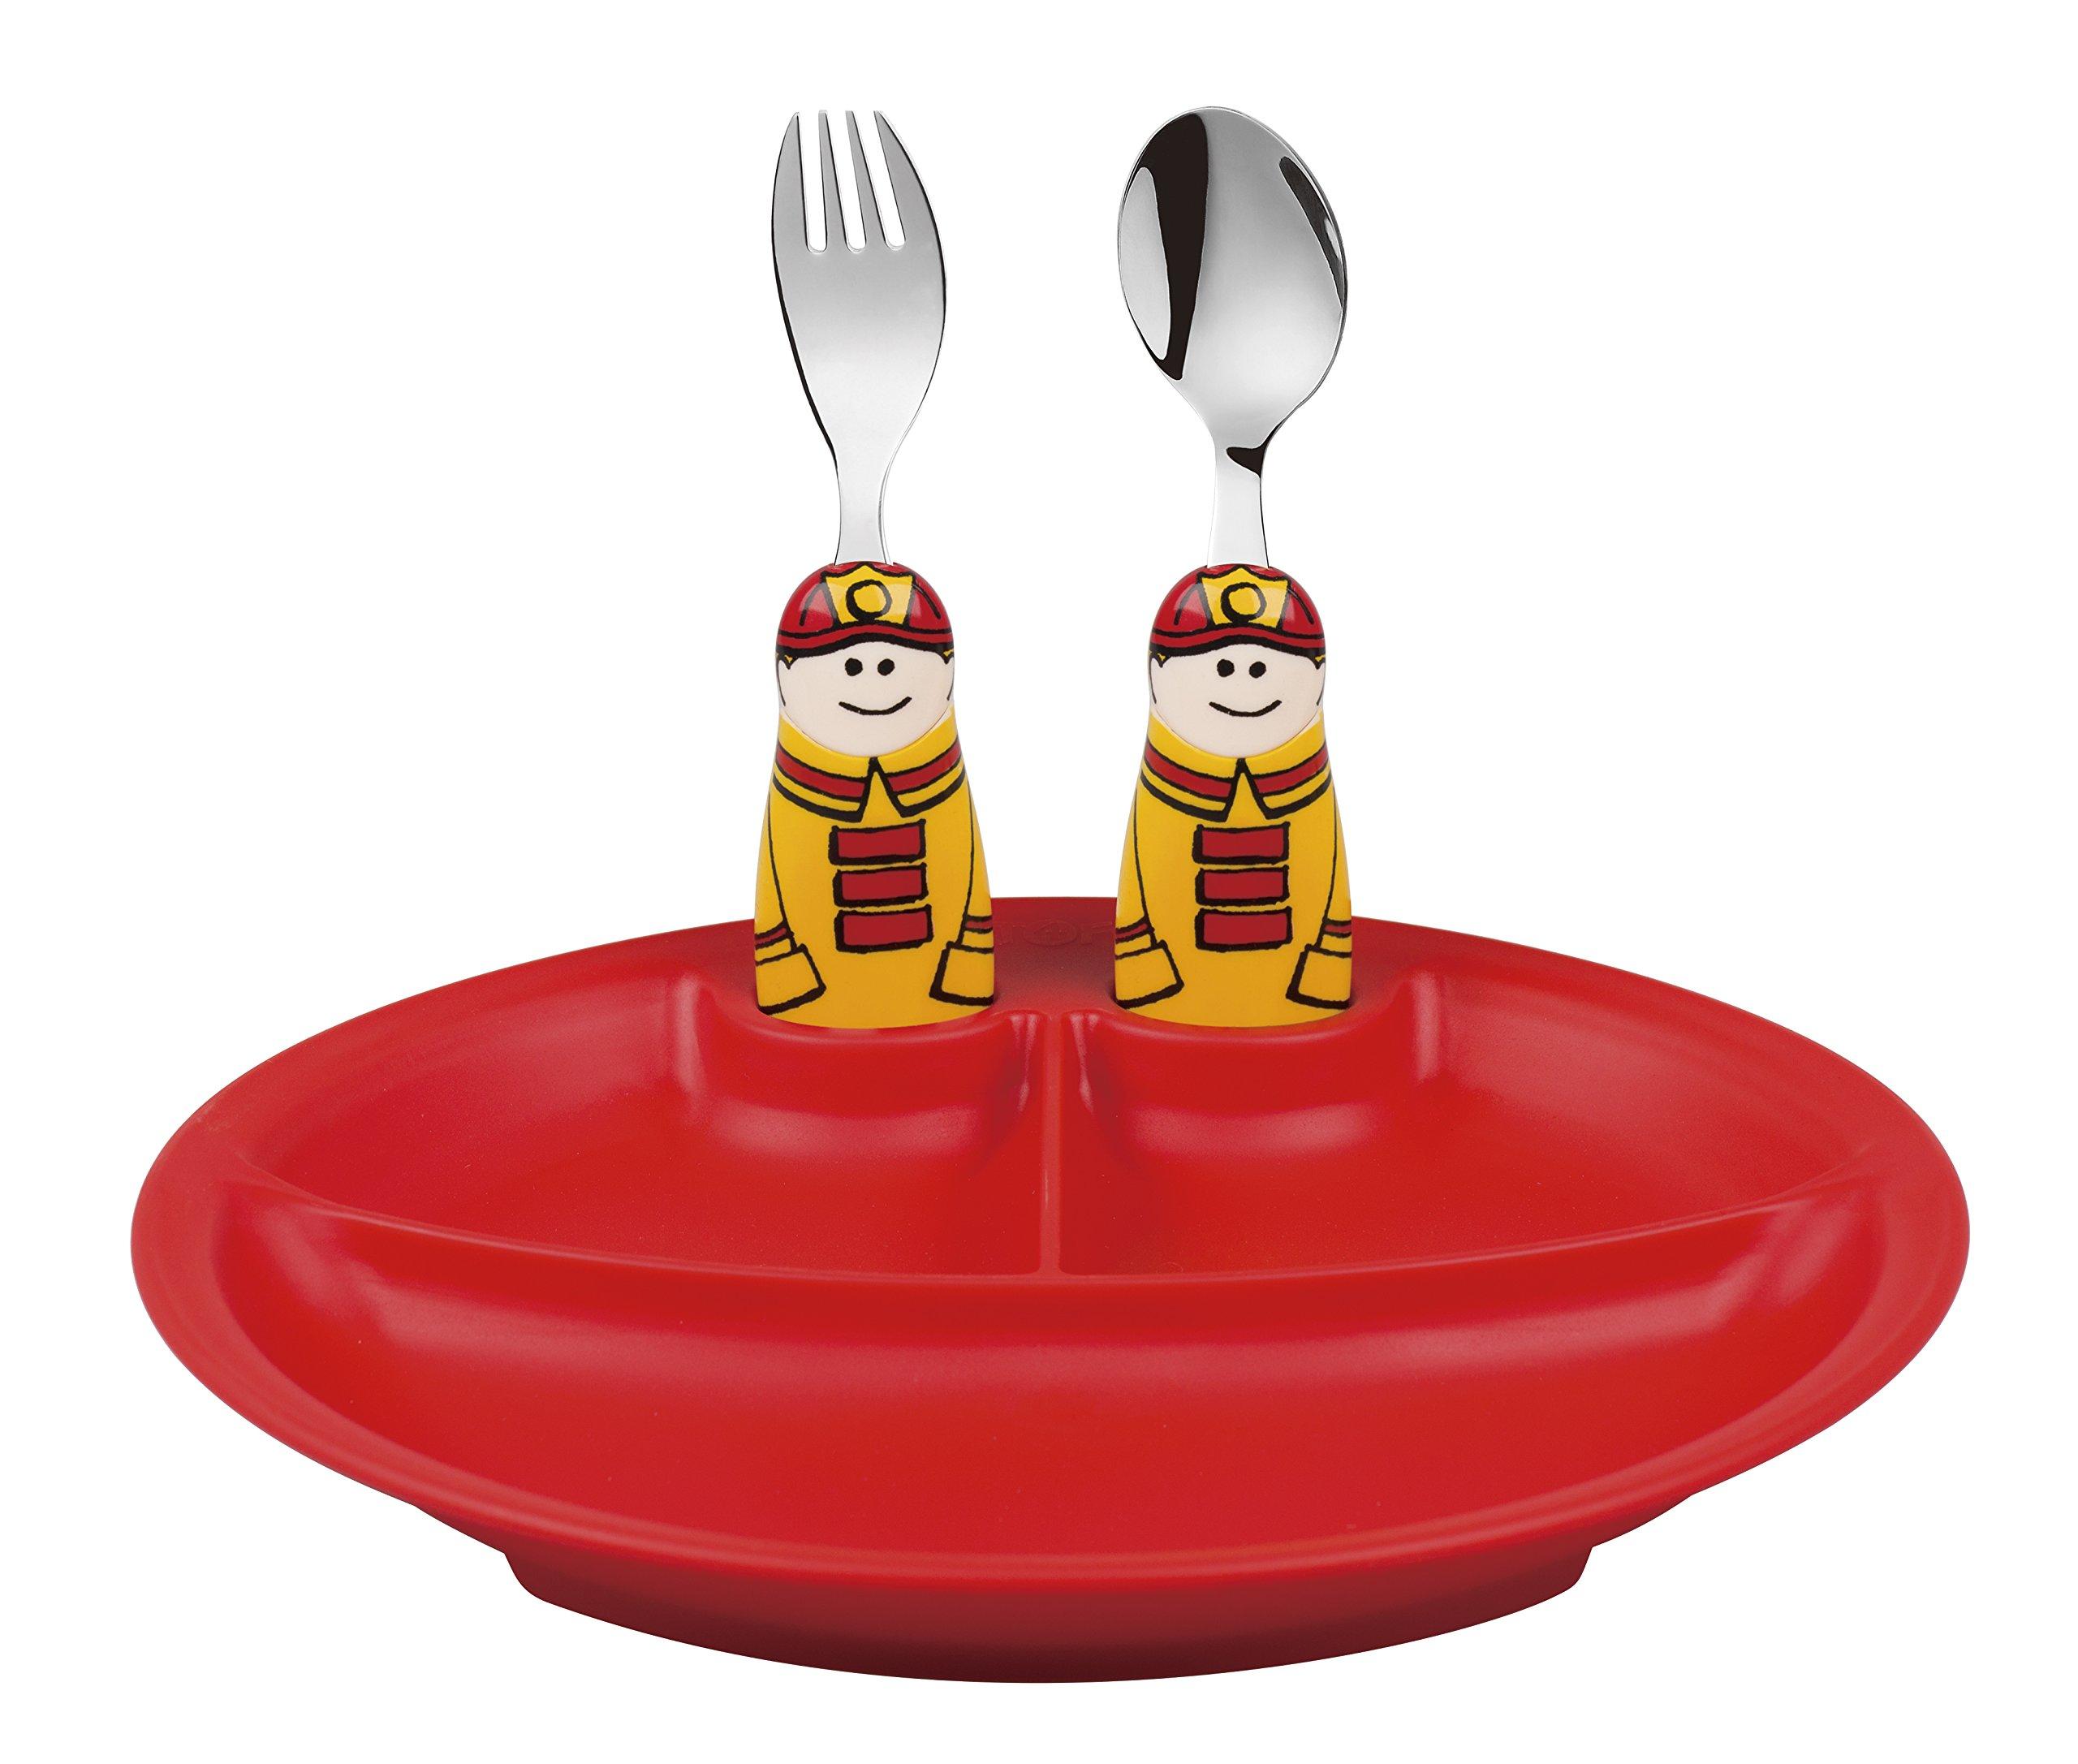 Eat4Fun Duo Collection Eat & Play 3-Piece Dinnerware Set, (Red Plate, Fireman Spoon, & Fireman Fork)